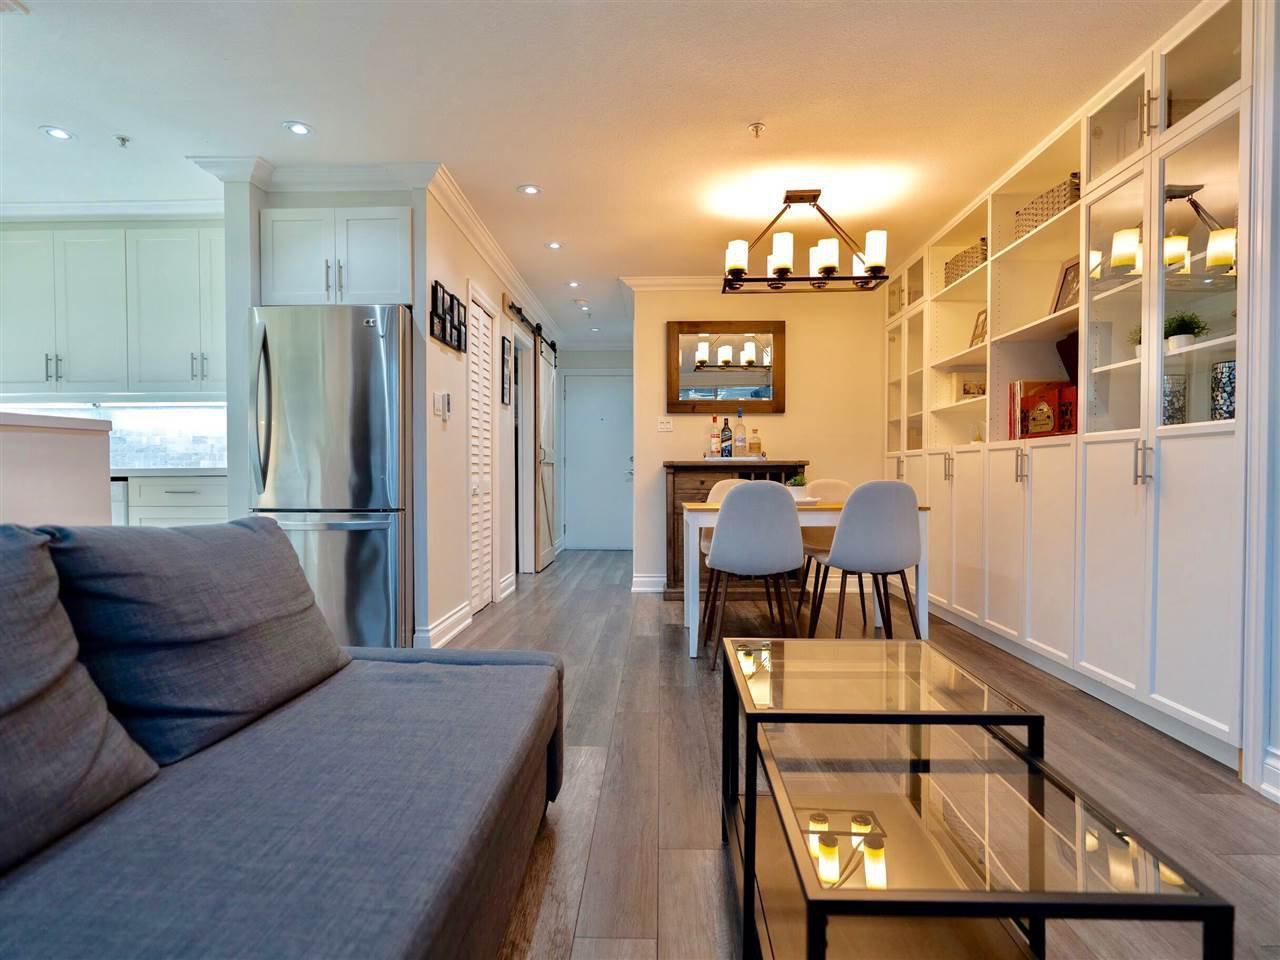 Main Photo: 203 2287 W 3RD Avenue in Vancouver: Kitsilano Condo for sale (Vancouver West)  : MLS®# R2320768